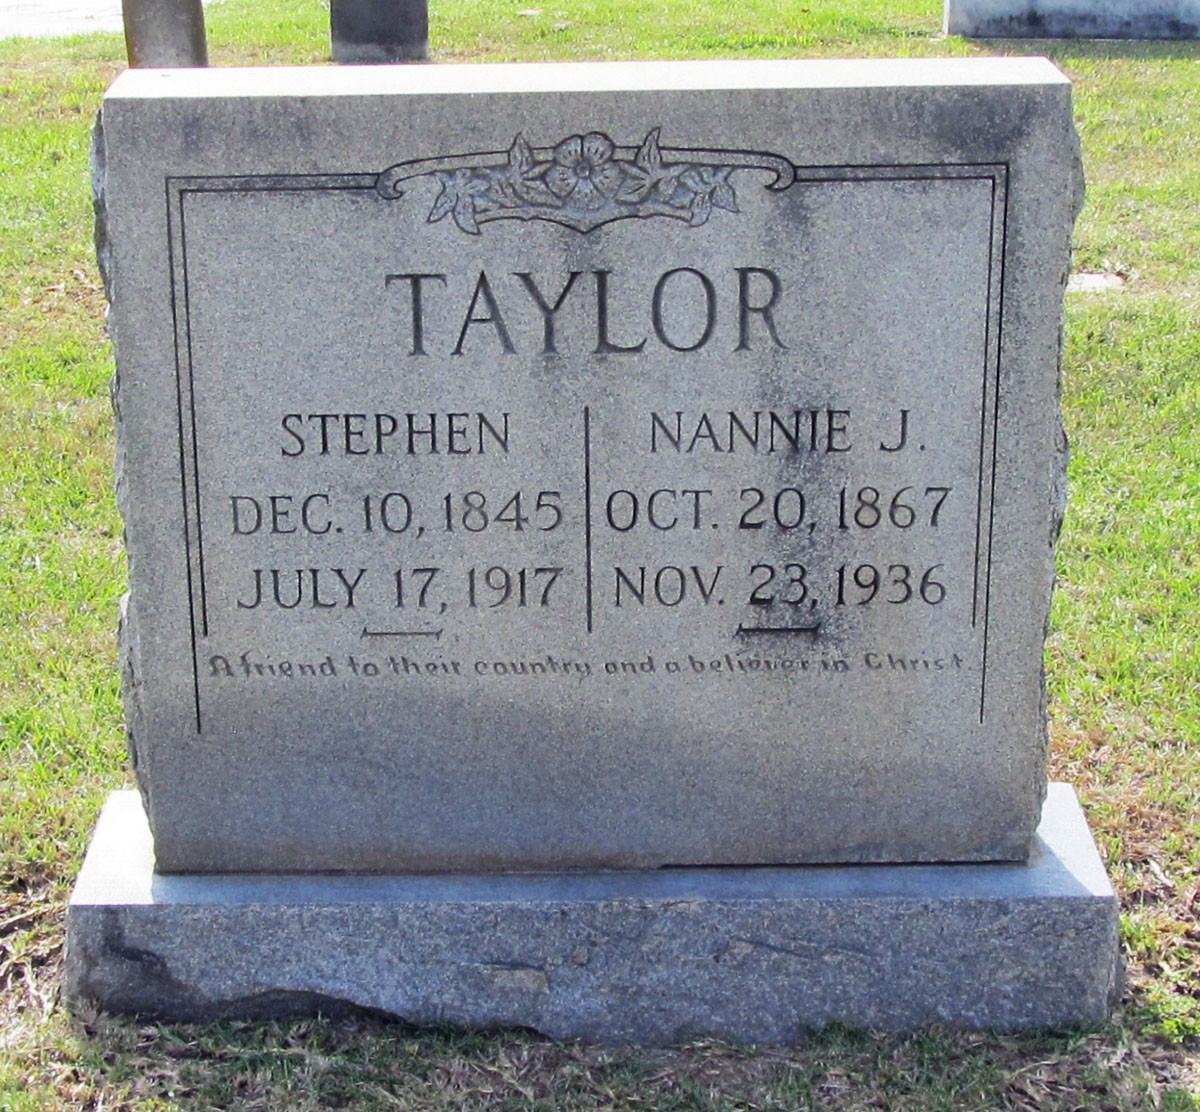 * Stephen Taylor